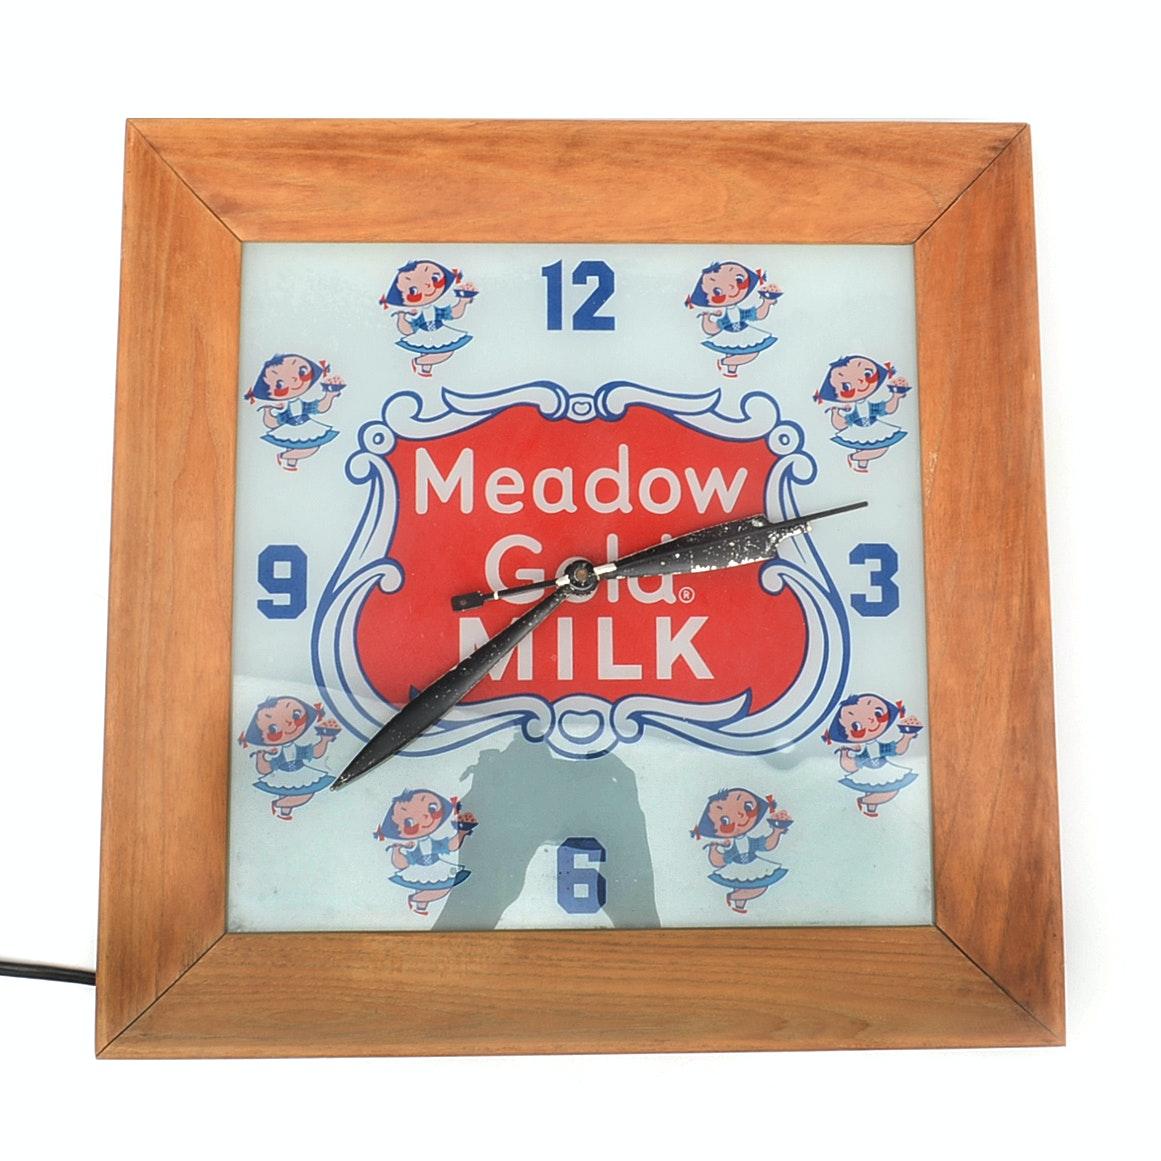 Mid-Century Meadow Gold Milk Clock